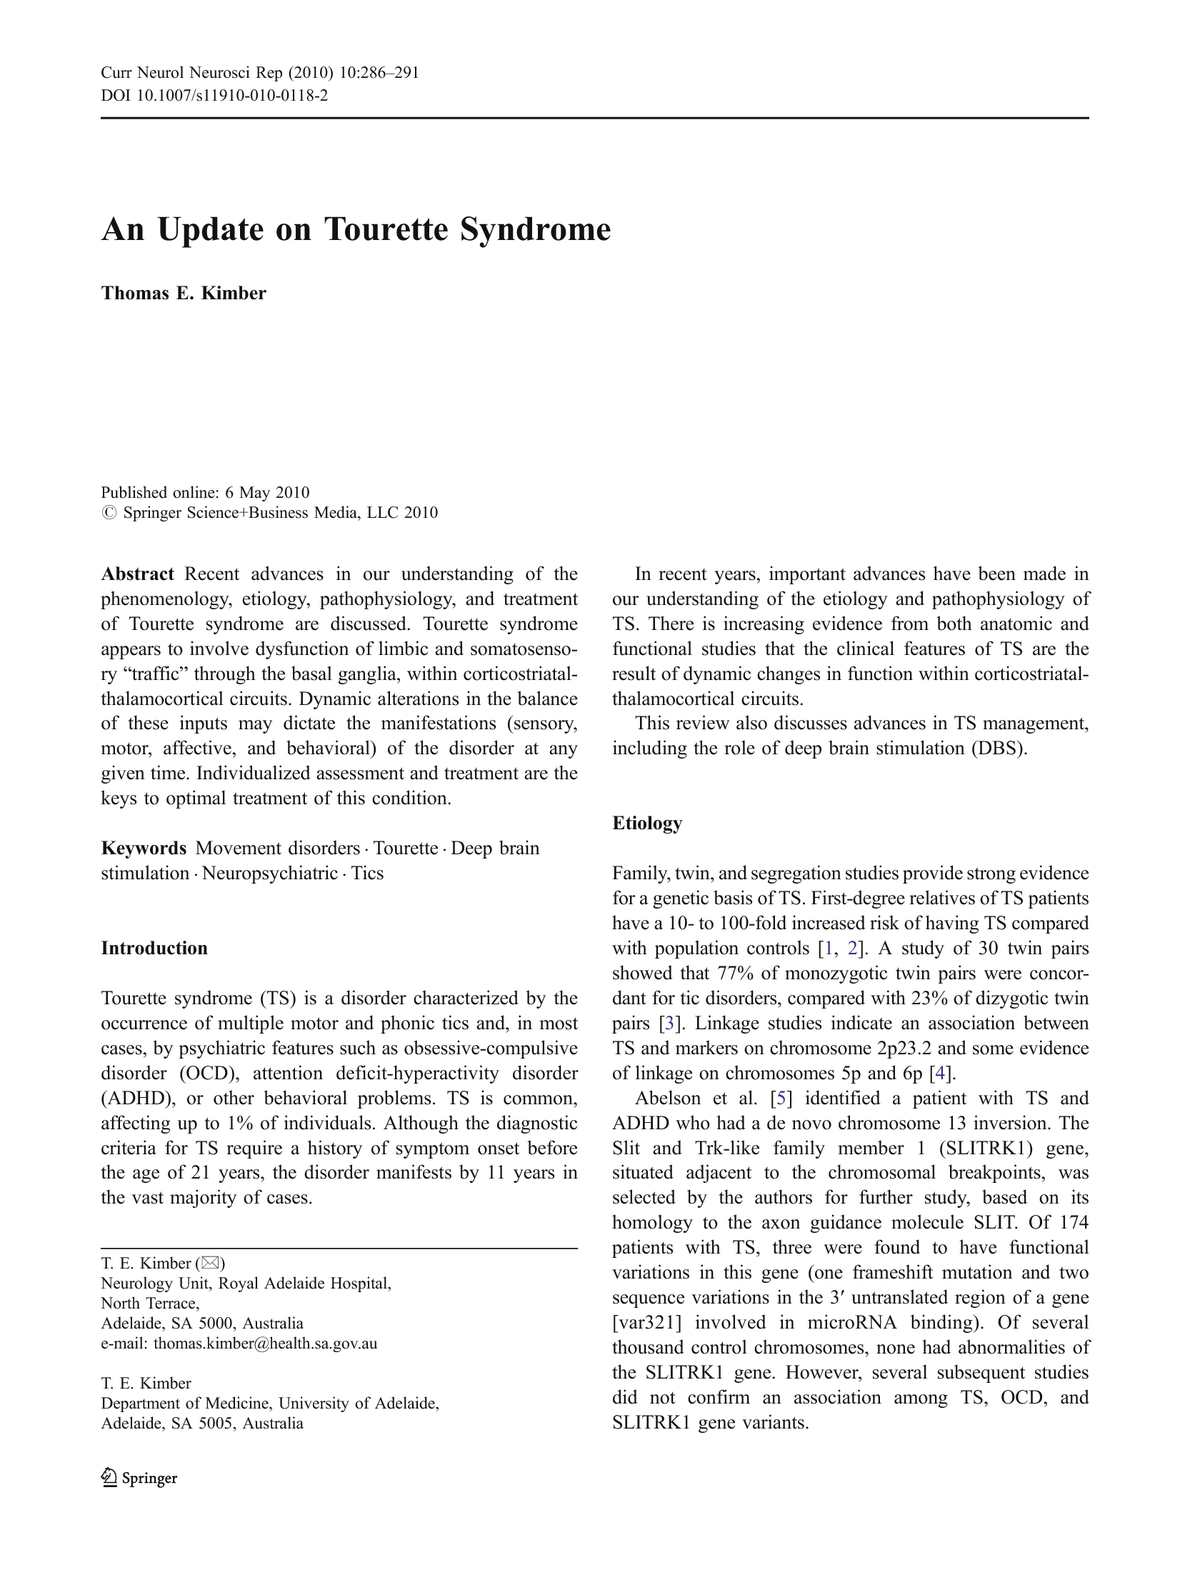 Slovakia azithromycin side effects bruising